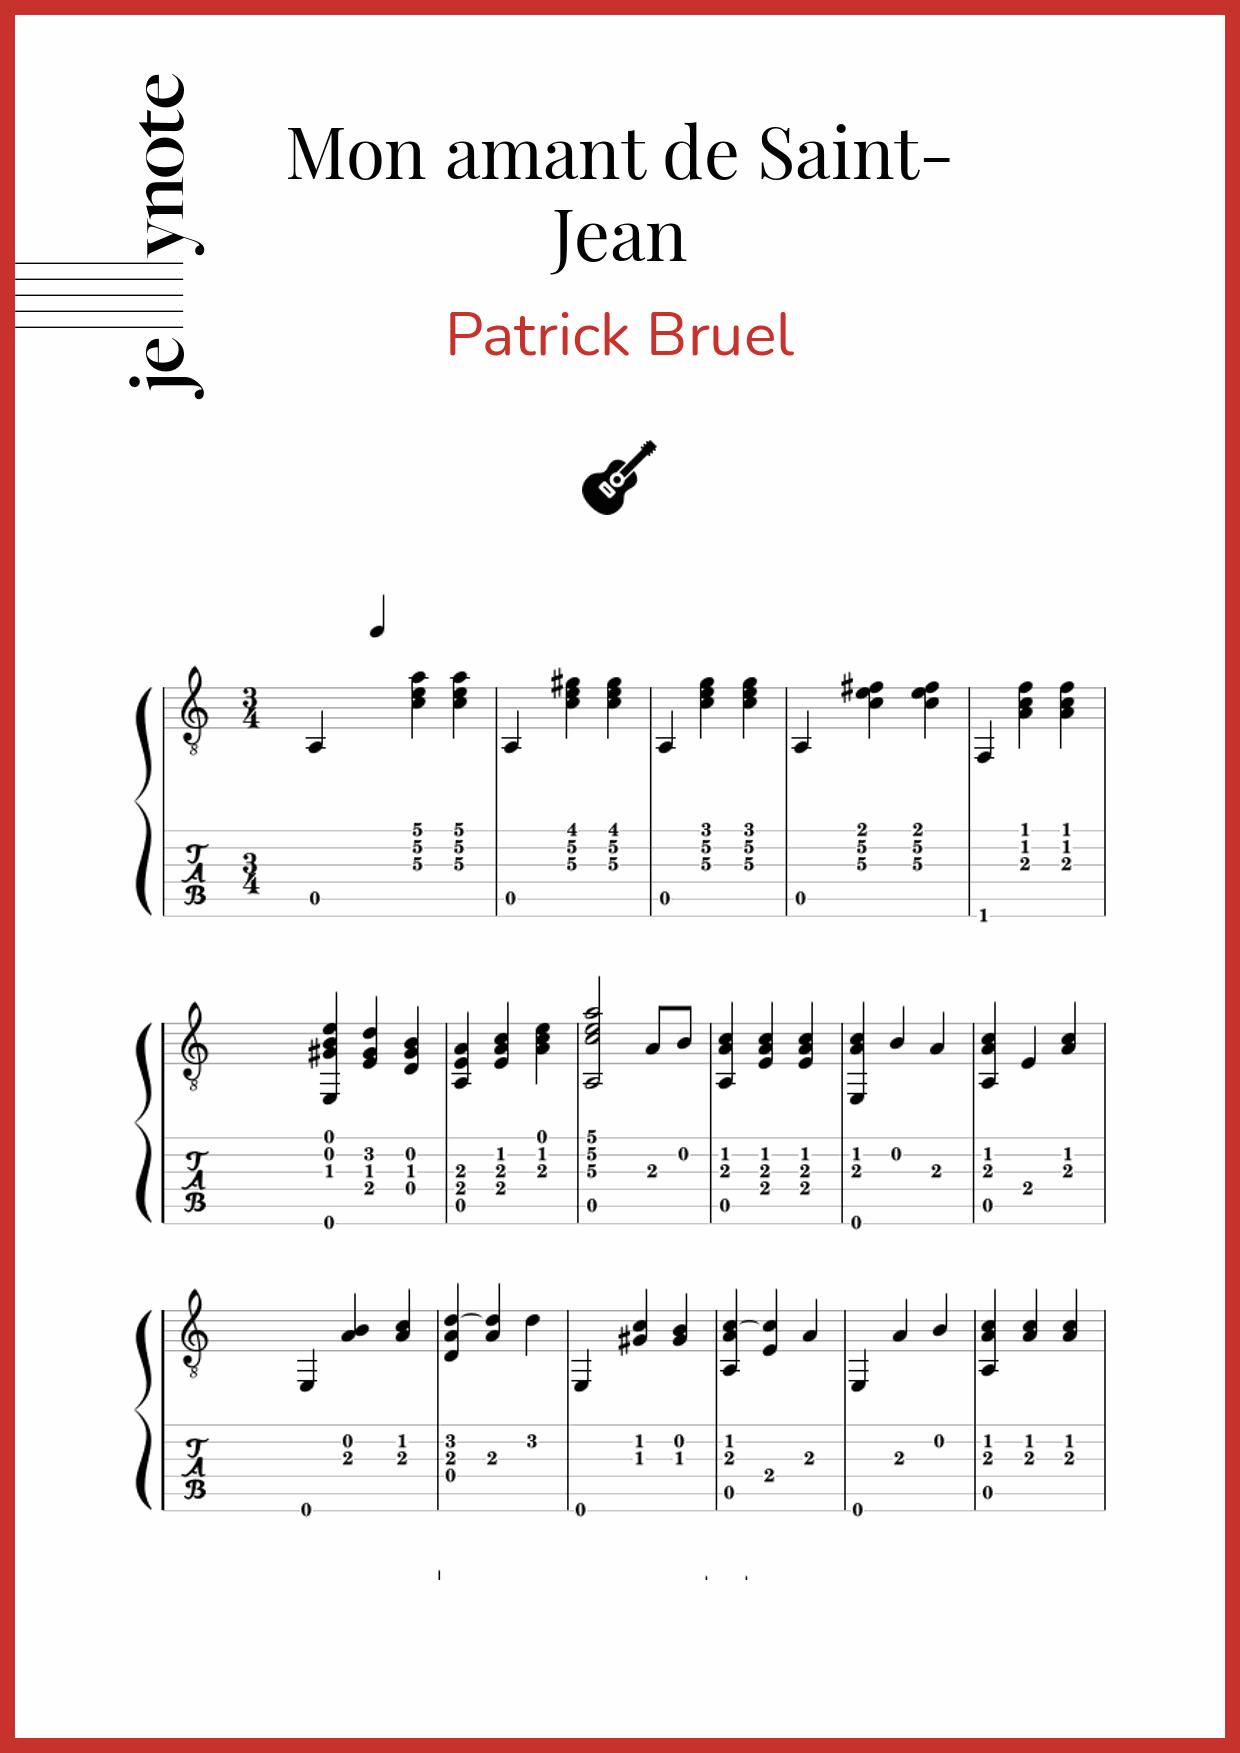 MON AMANT DE ST. JEAN - Patrick Bruel - LETRAS.COM